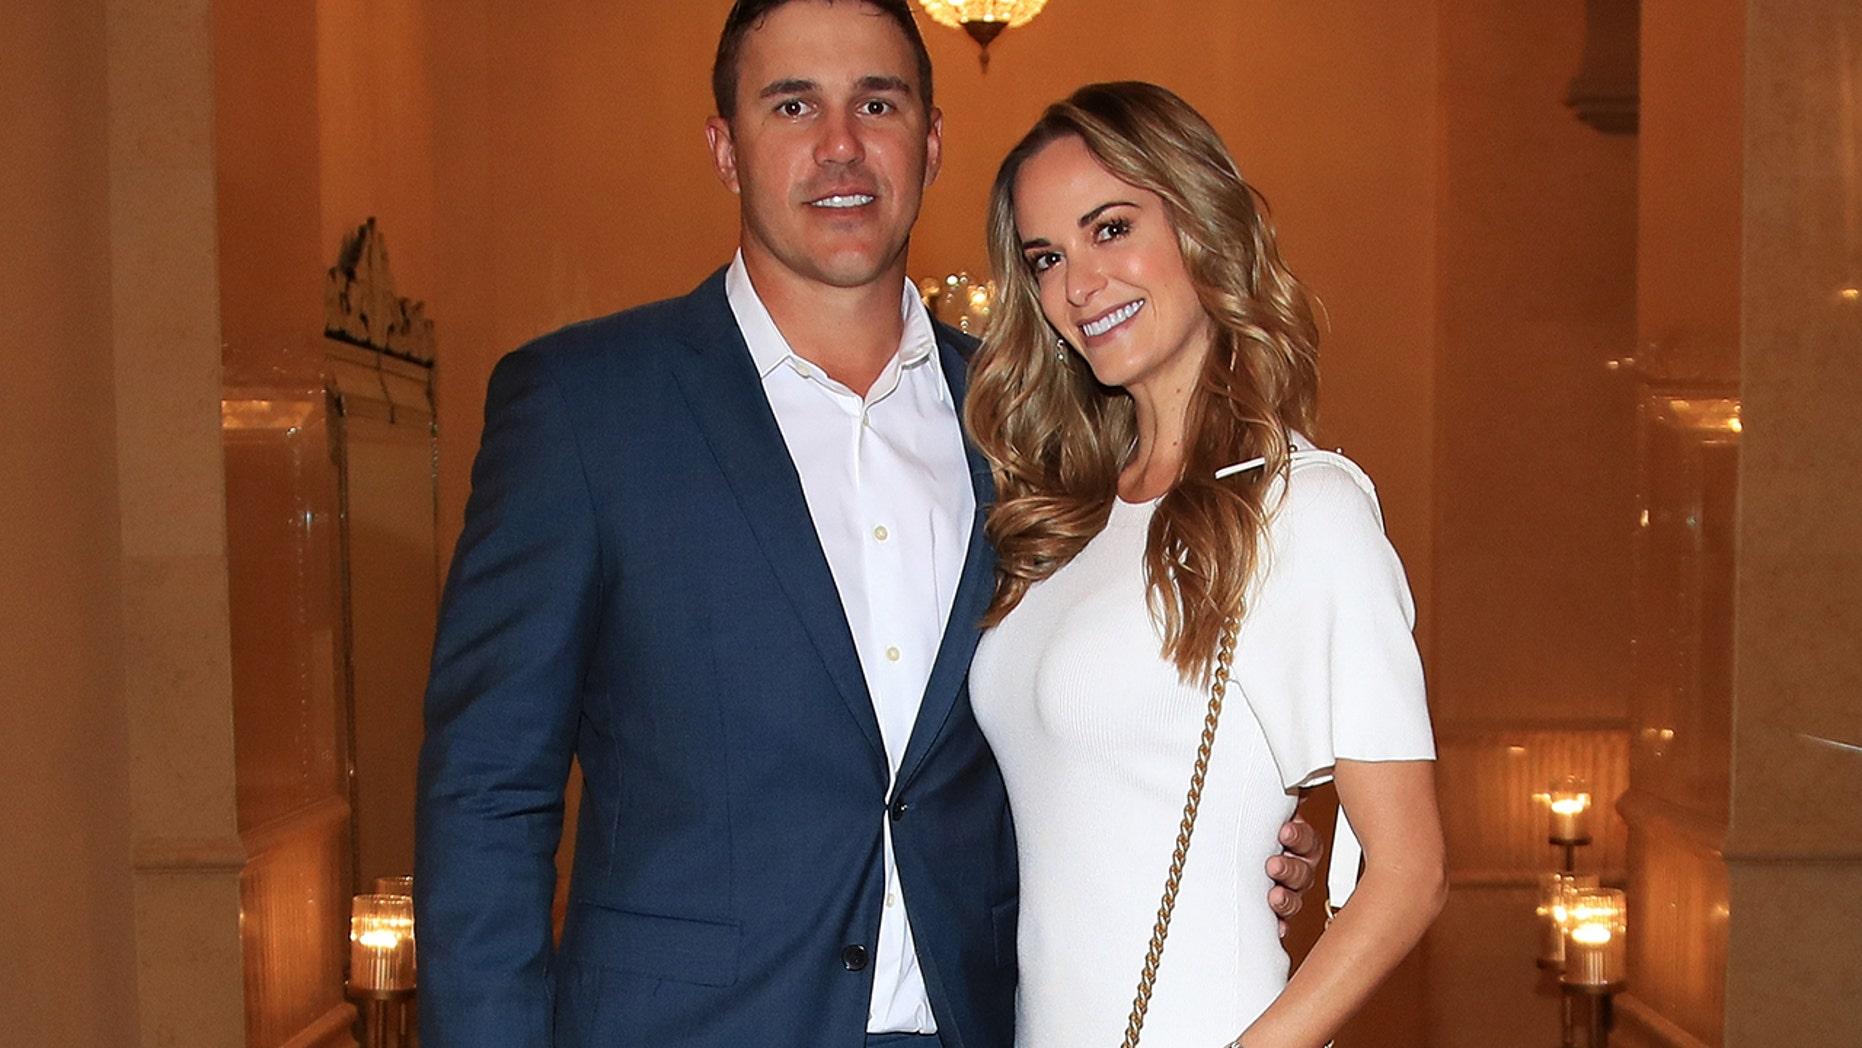 Brooks Koepka of the United States and girlfriend Jena Sims pose for a photo ahead of the Abu Dhabi HSBC Golf Championship at the Abu Dhabi Golf Club on January 14, 2019 in Abu Dhabi, United Arab Emirates.